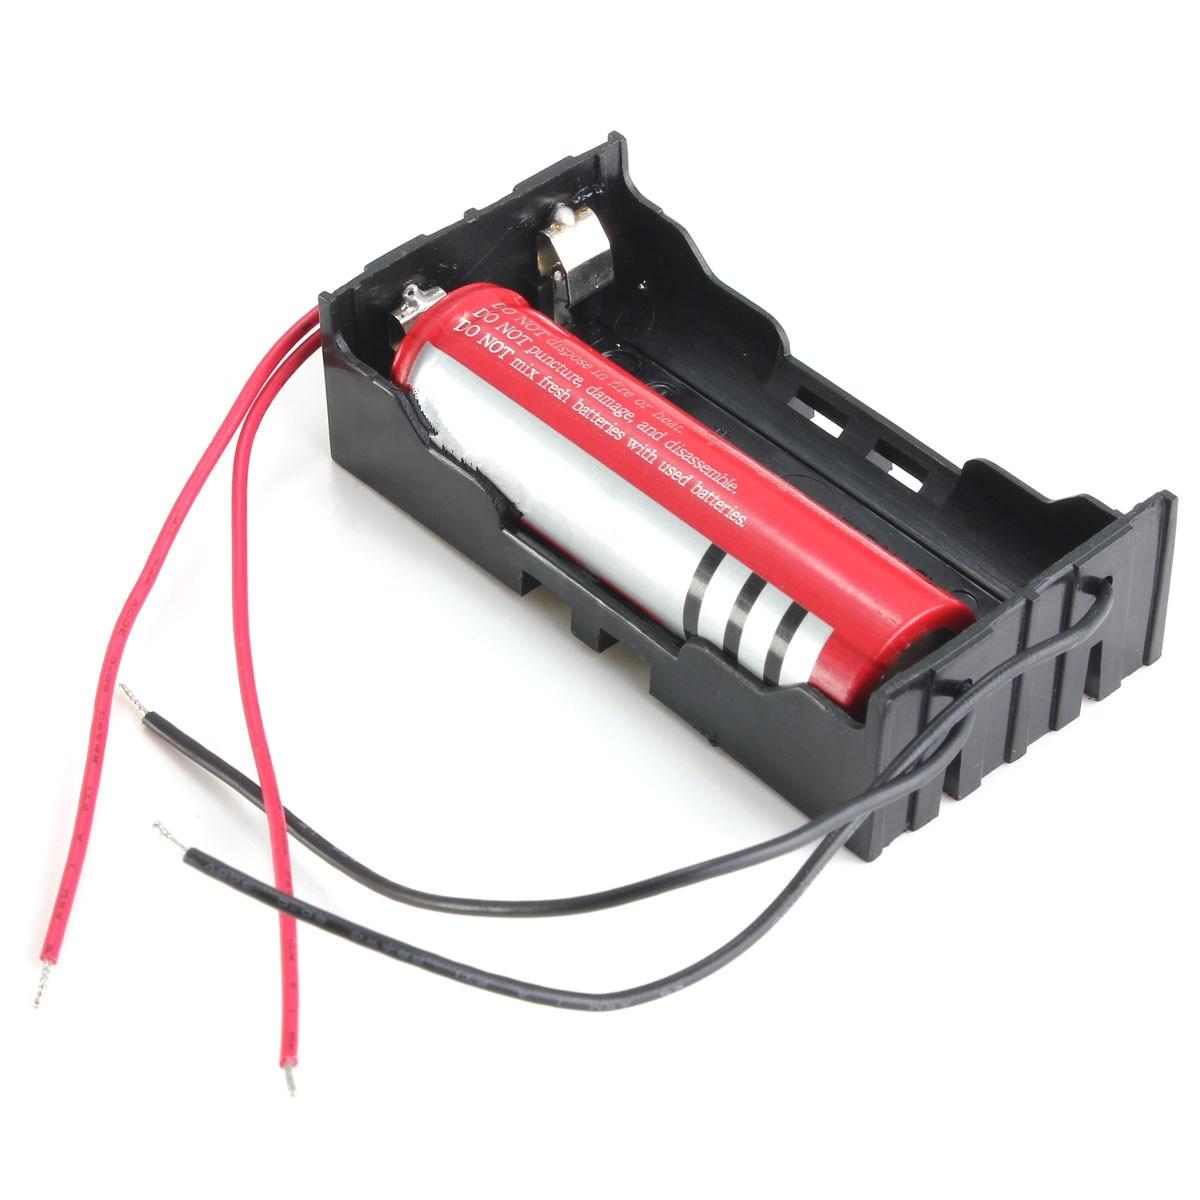 Hot Sale Black Plastic 2 Way 2 Slots 18650 Battery Storage Case Box Ho